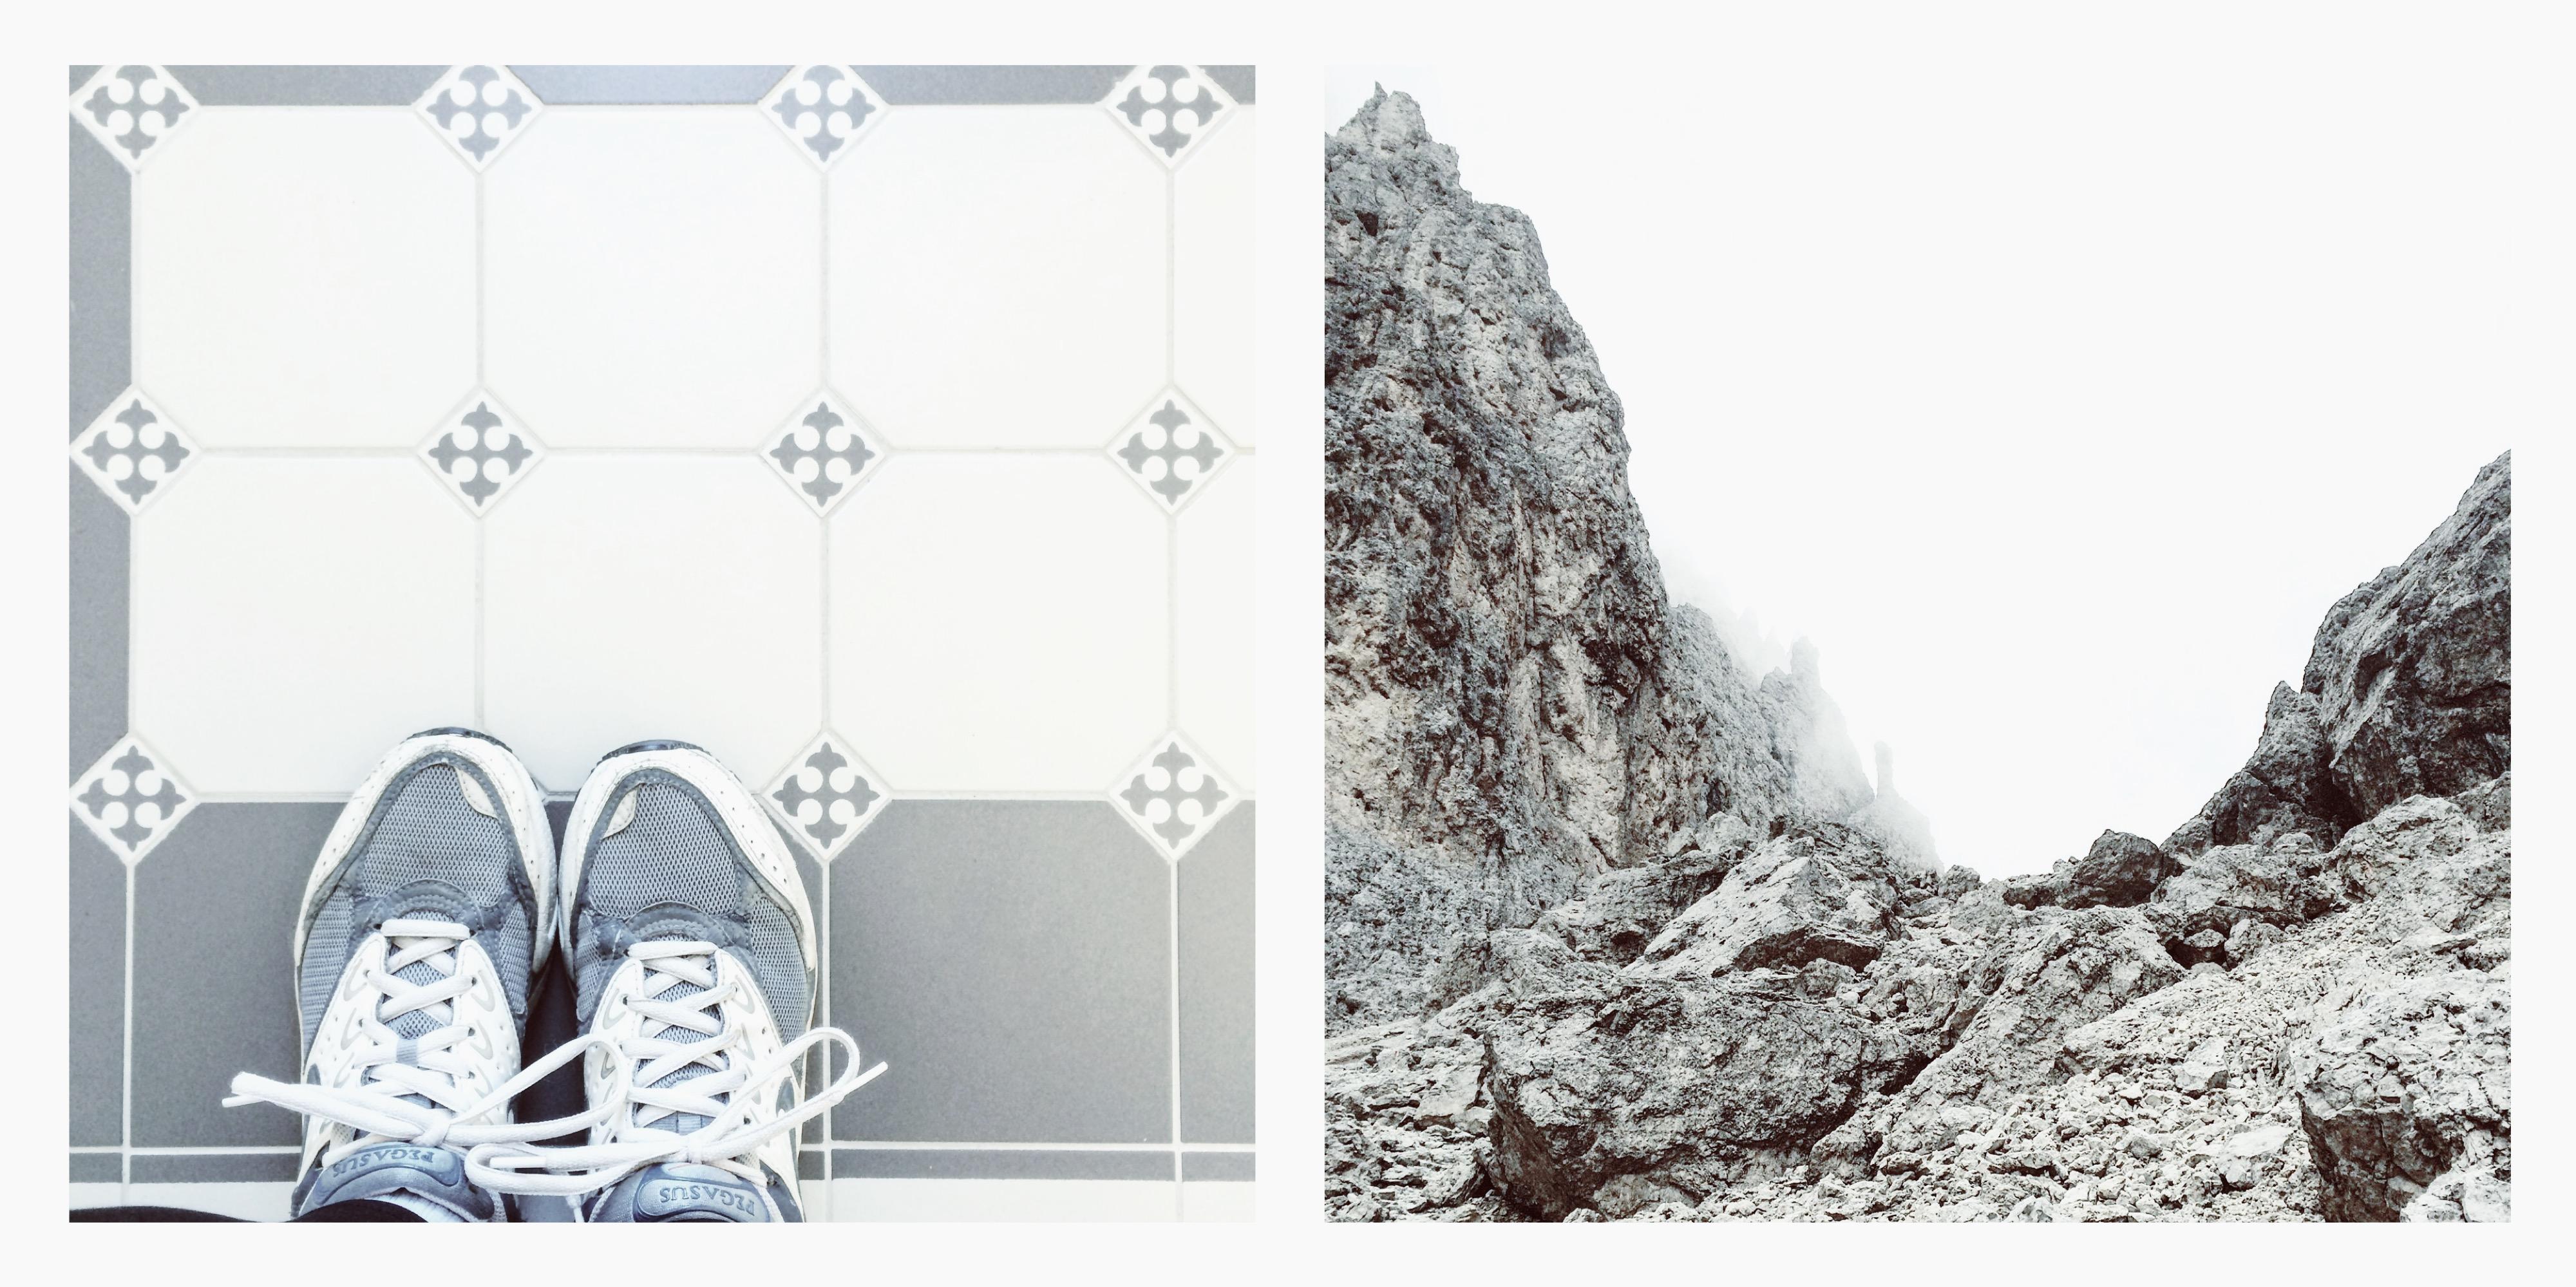 Collage-Oktober-Instagram-Jennadores-Blog-Rückblick-Walken-Wandern-Dolomiten